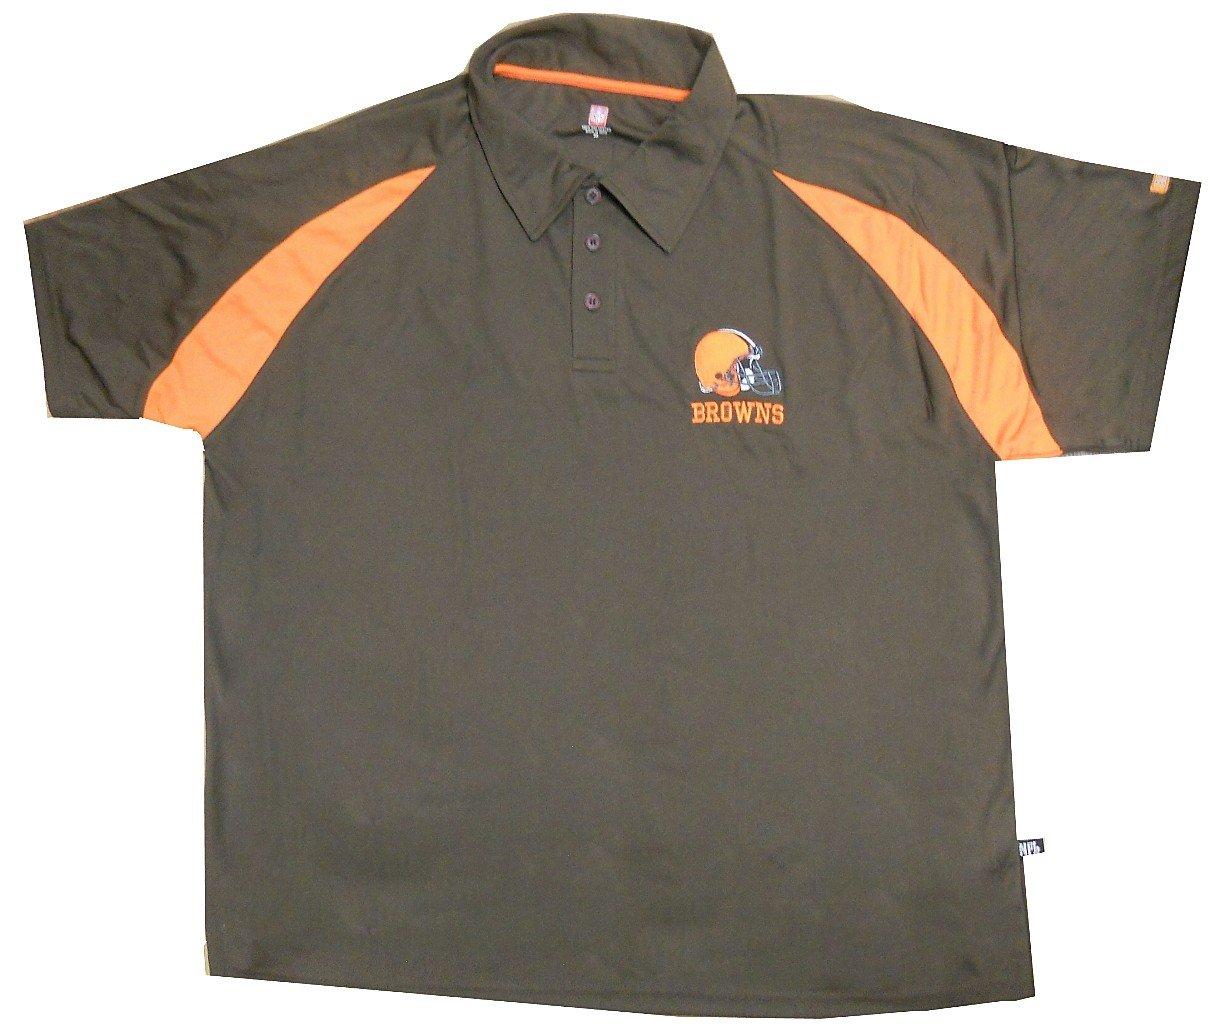 Cleveland Browns Nfl para hombre ropa de equipo poliéster Polo ...